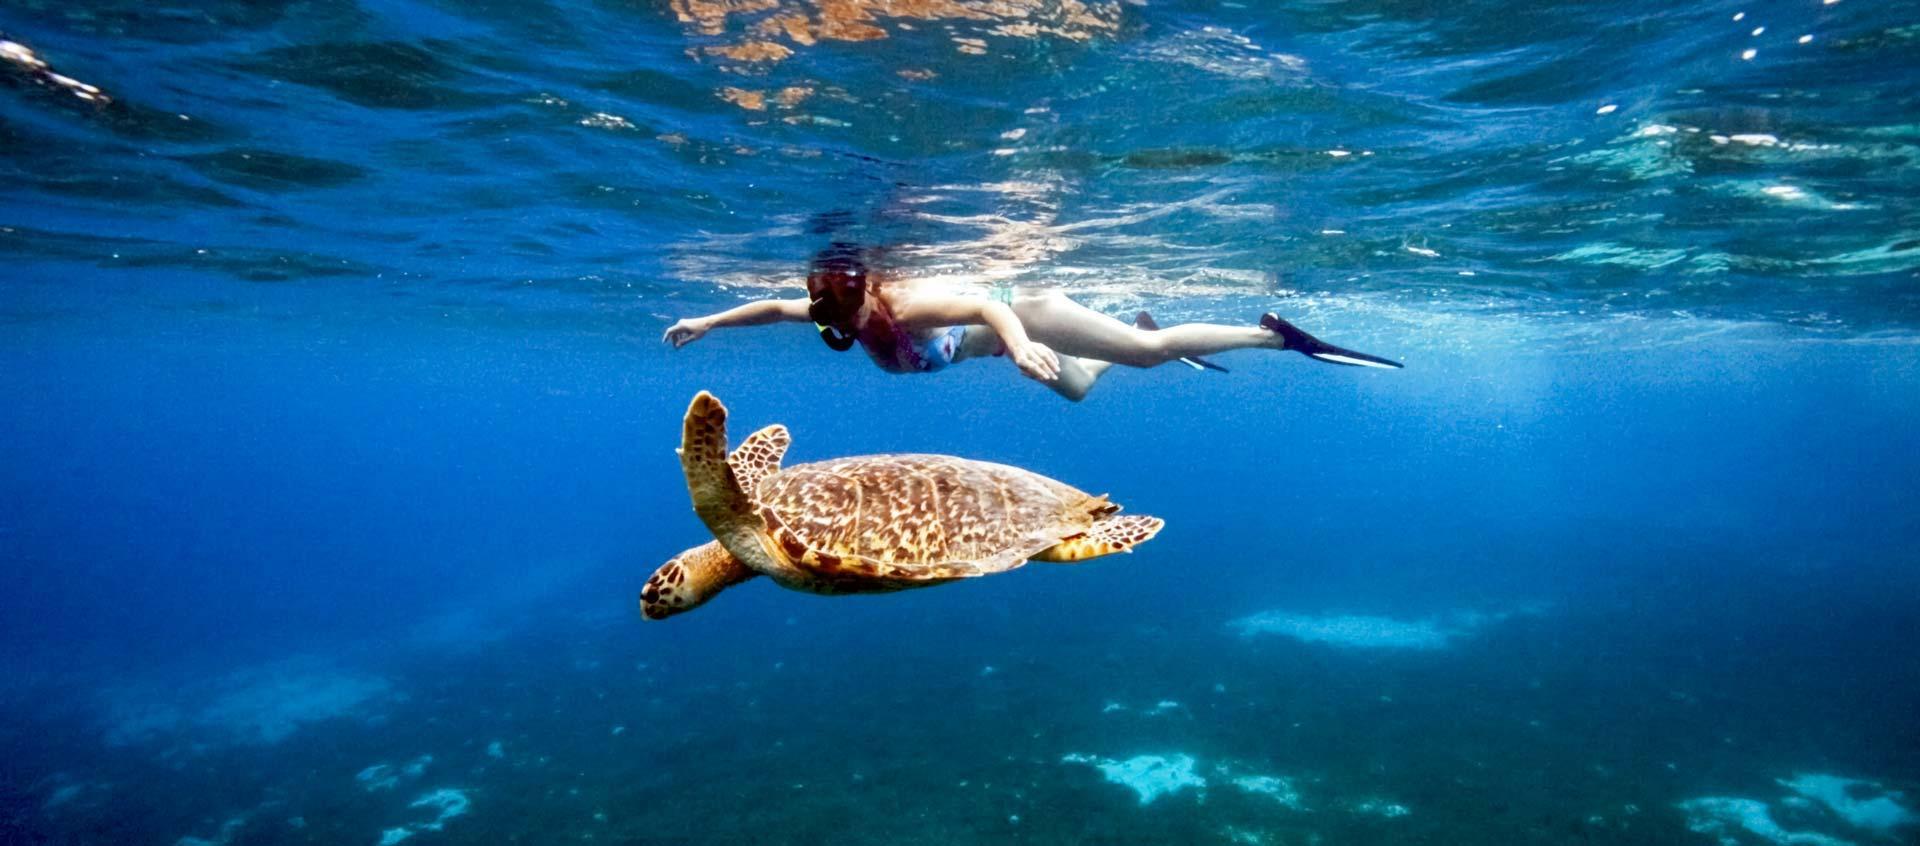 Barefoot fun in the British Virgin Islands